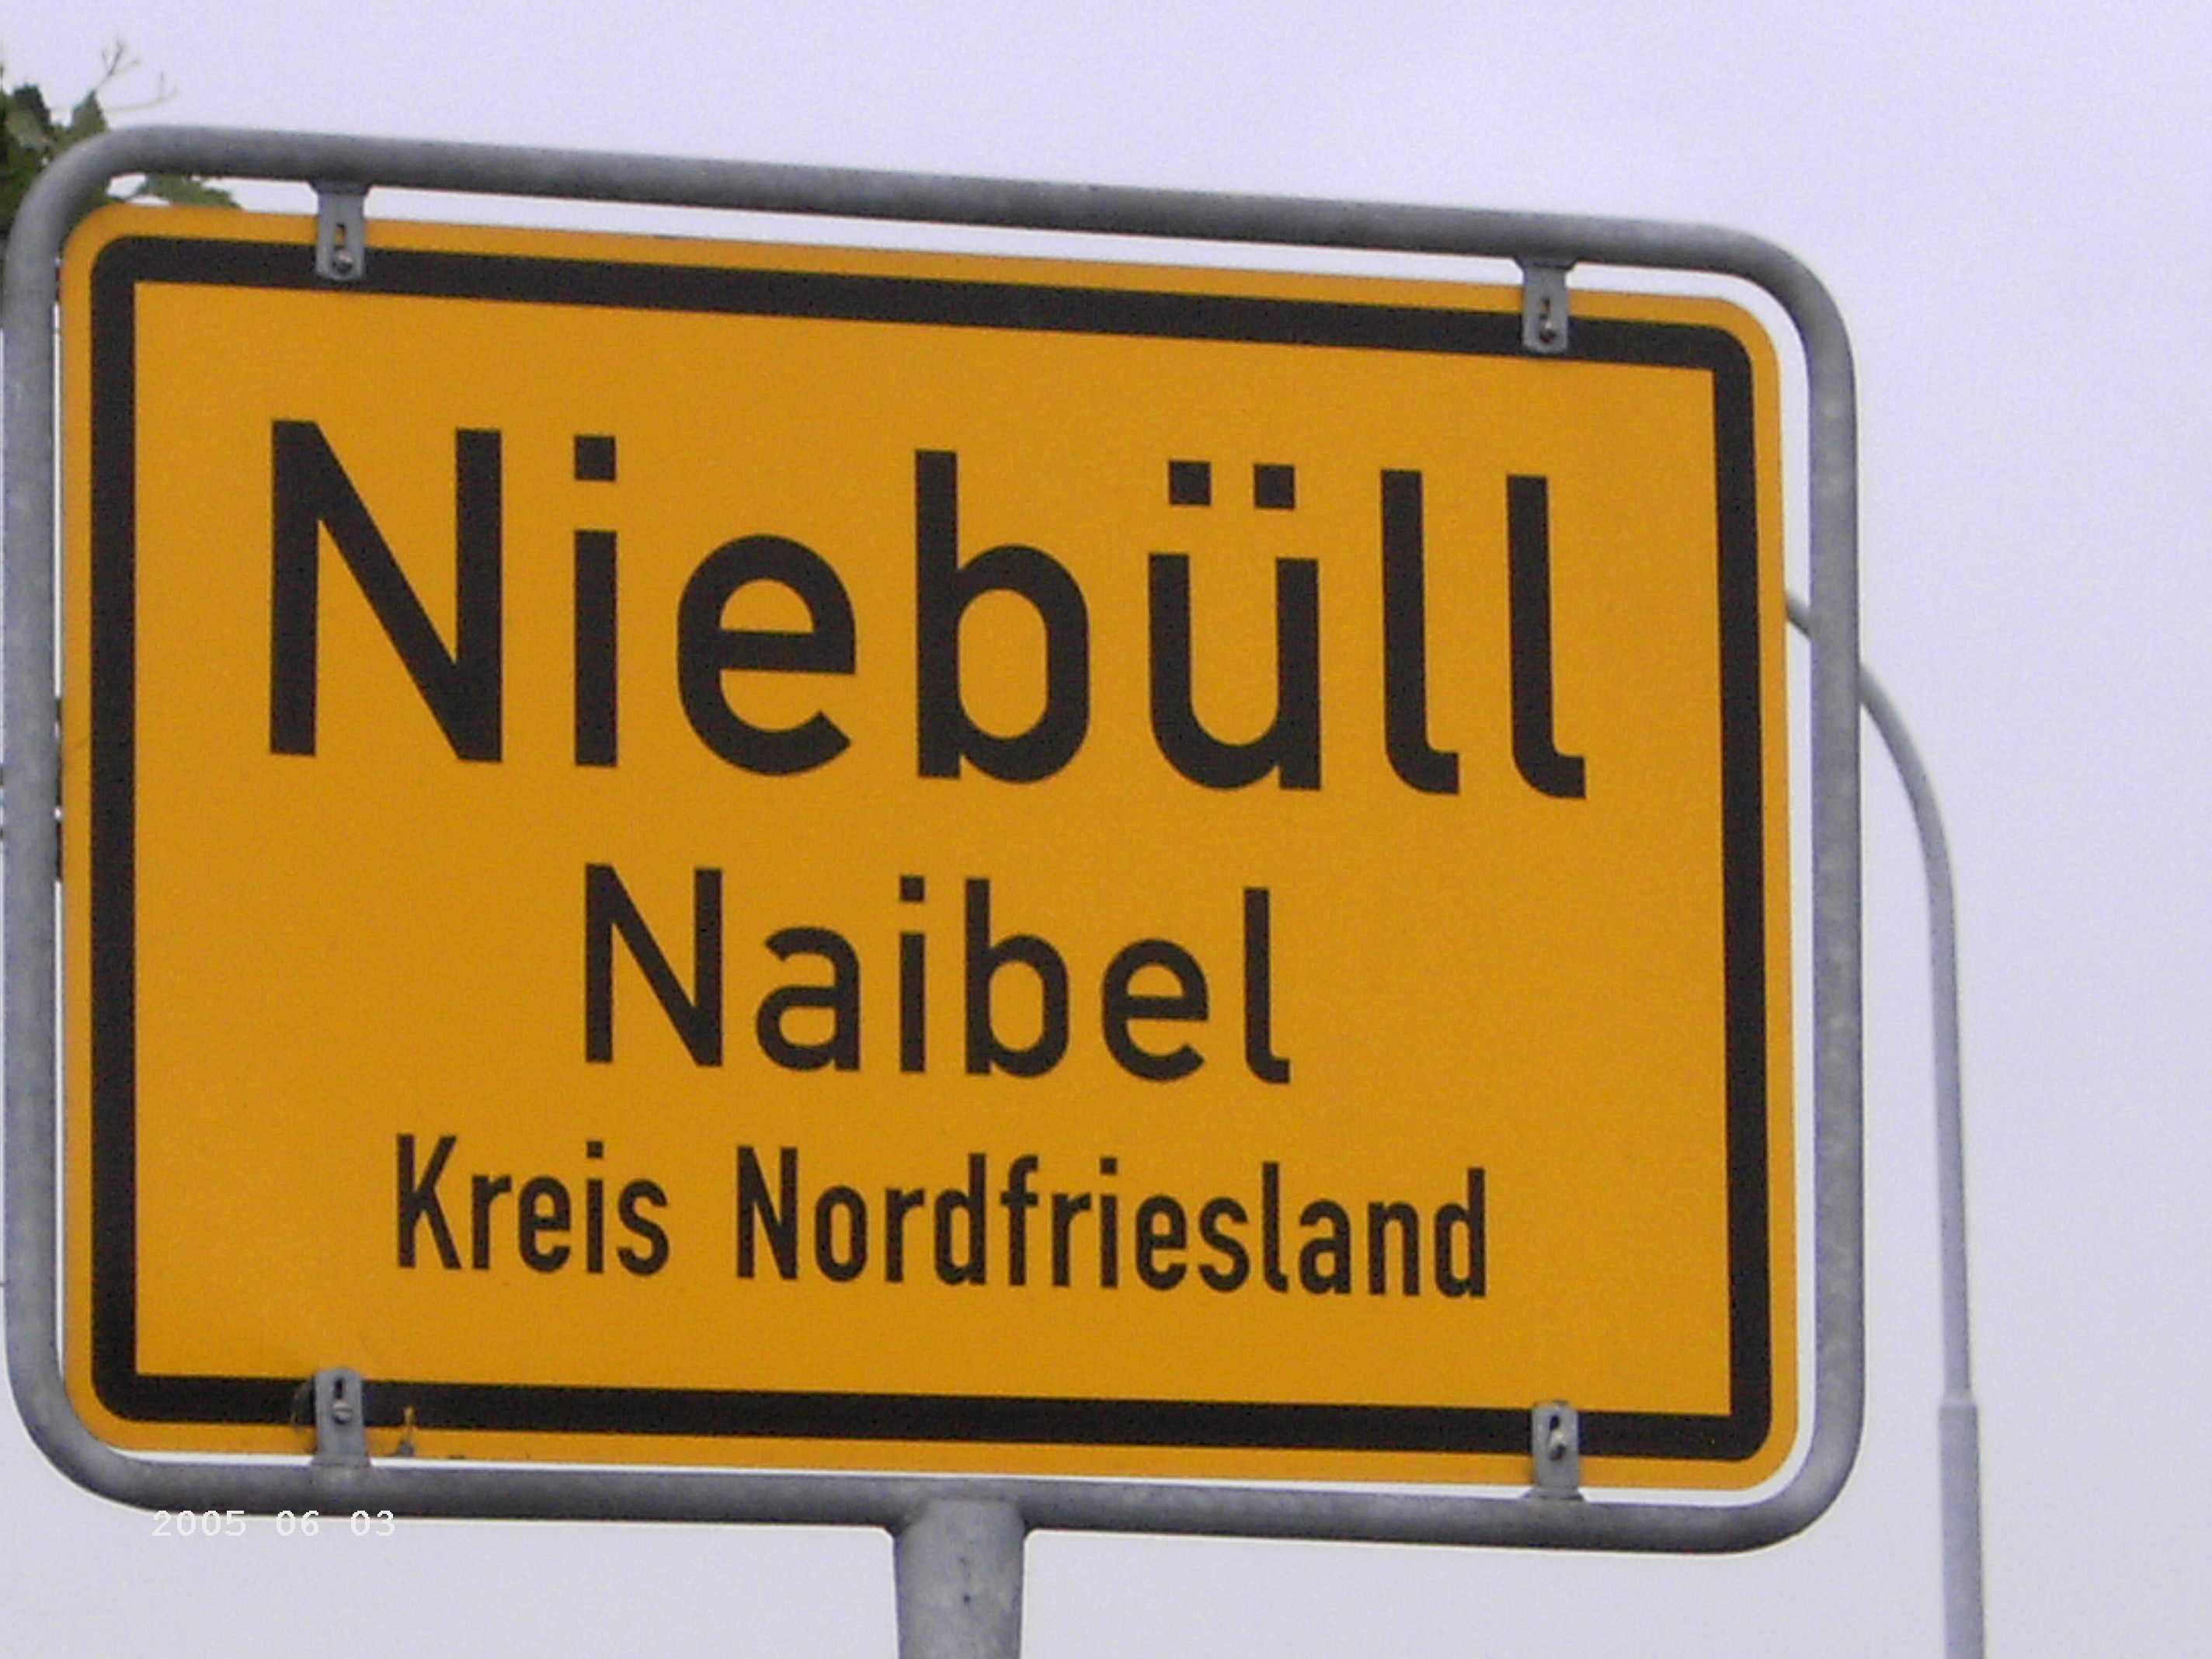 Niebull